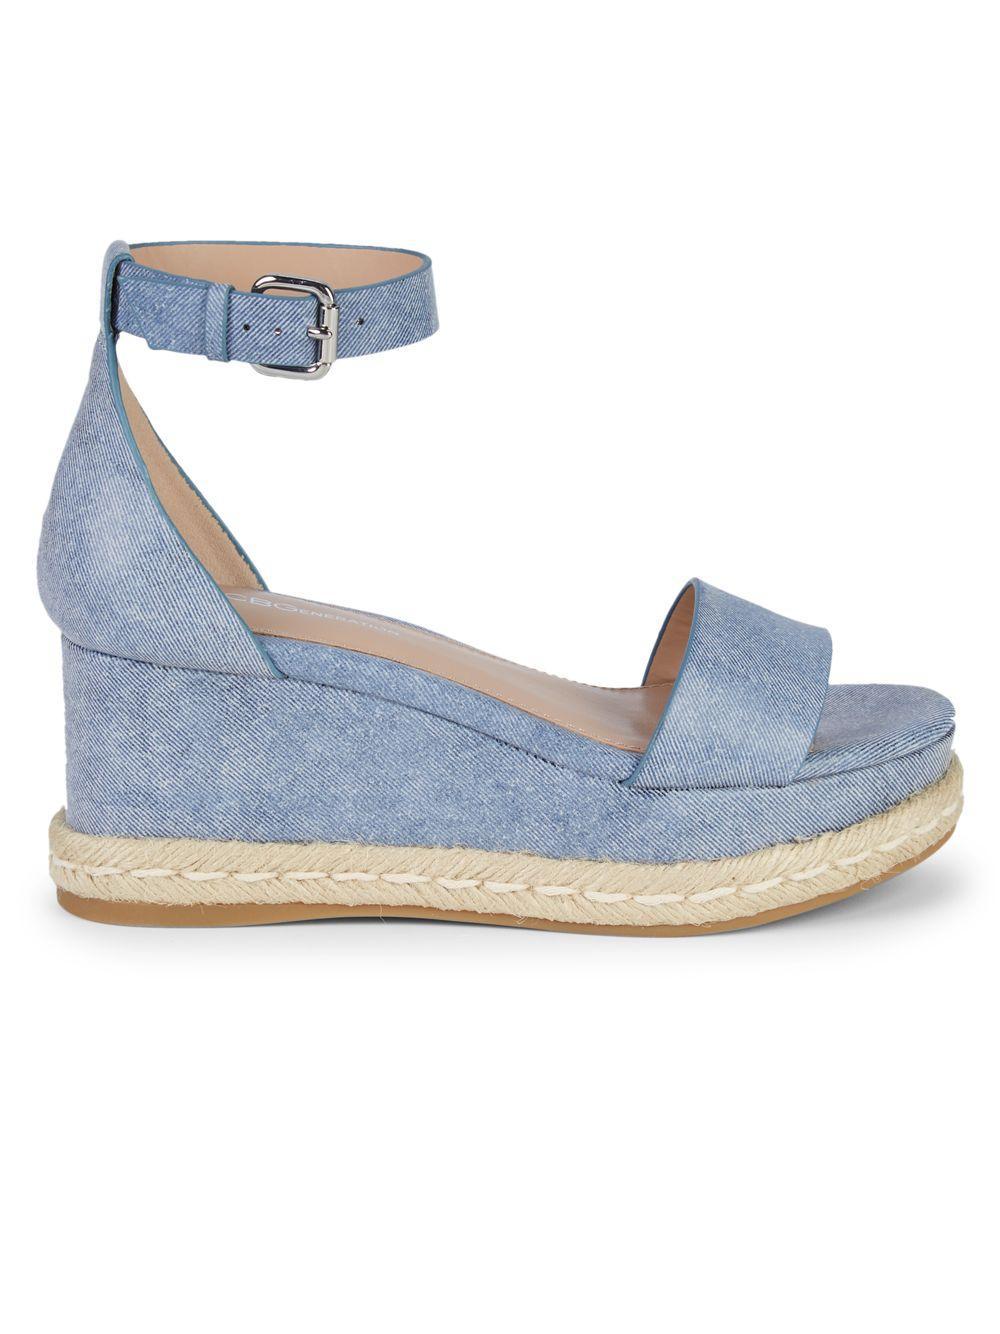 aa1ee23e250 BCBGeneration Addie Espadrille Wedge Sandals in Blue - Save 17% - Lyst